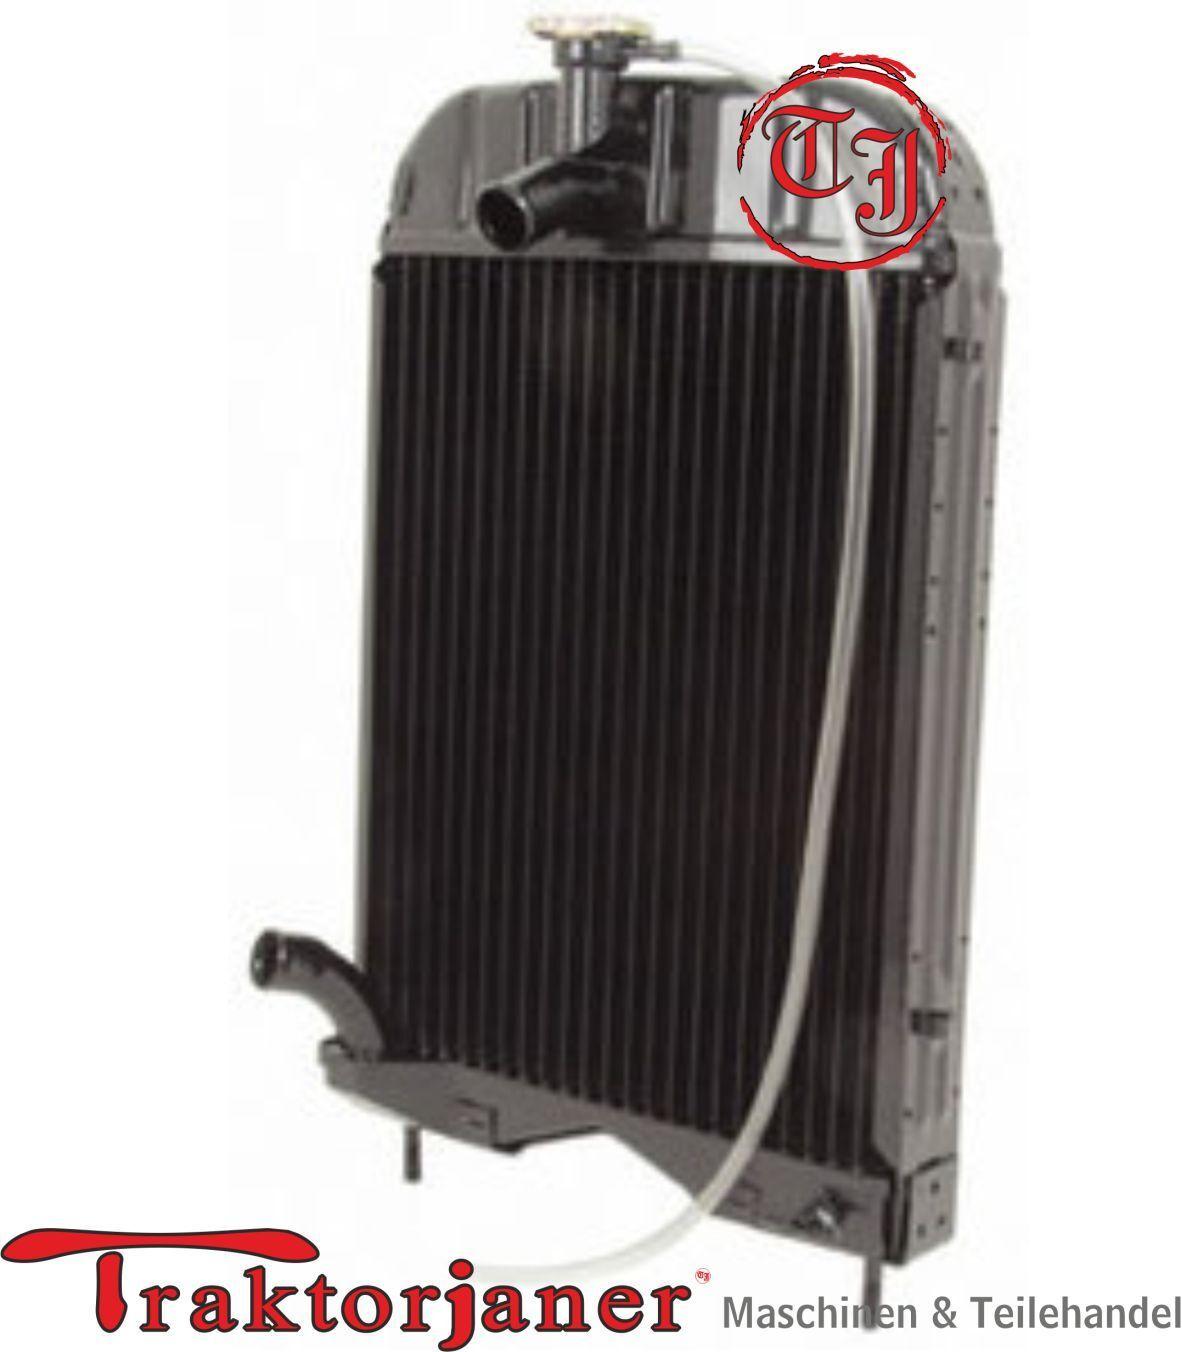 TJ - Perkins 153 radiador para tractores Massey Ferguson 135-152 con Perkins - ad3.152 9ecf57